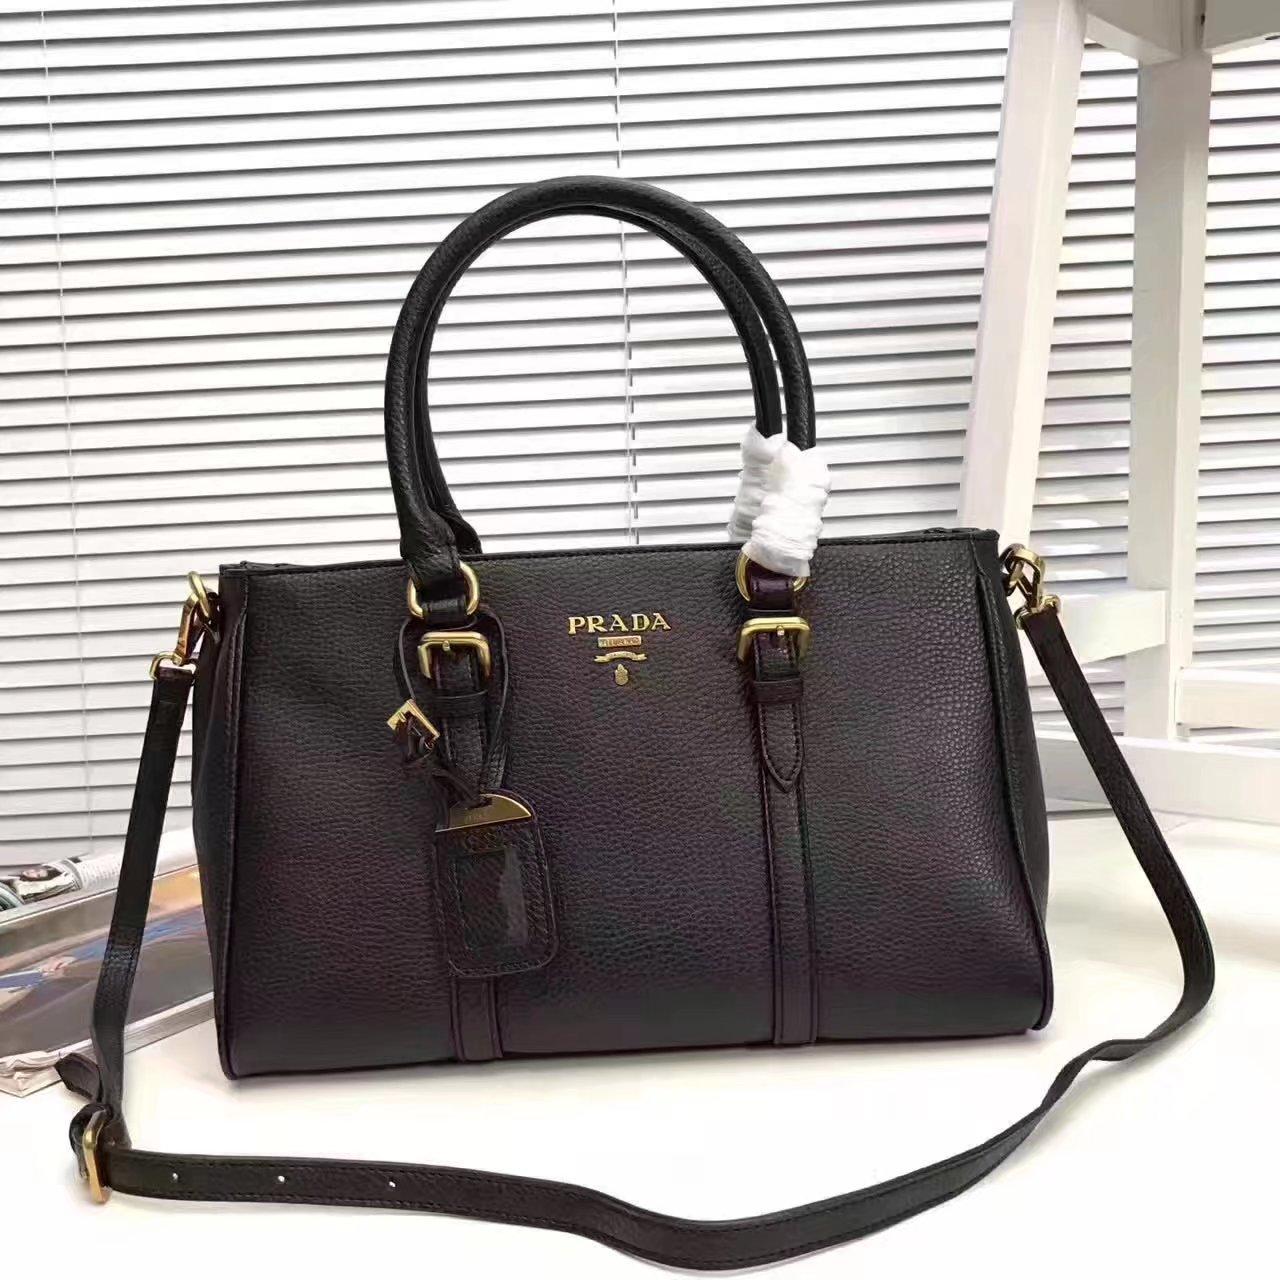 Prada 2996 Women 175 Tote Handbag Black